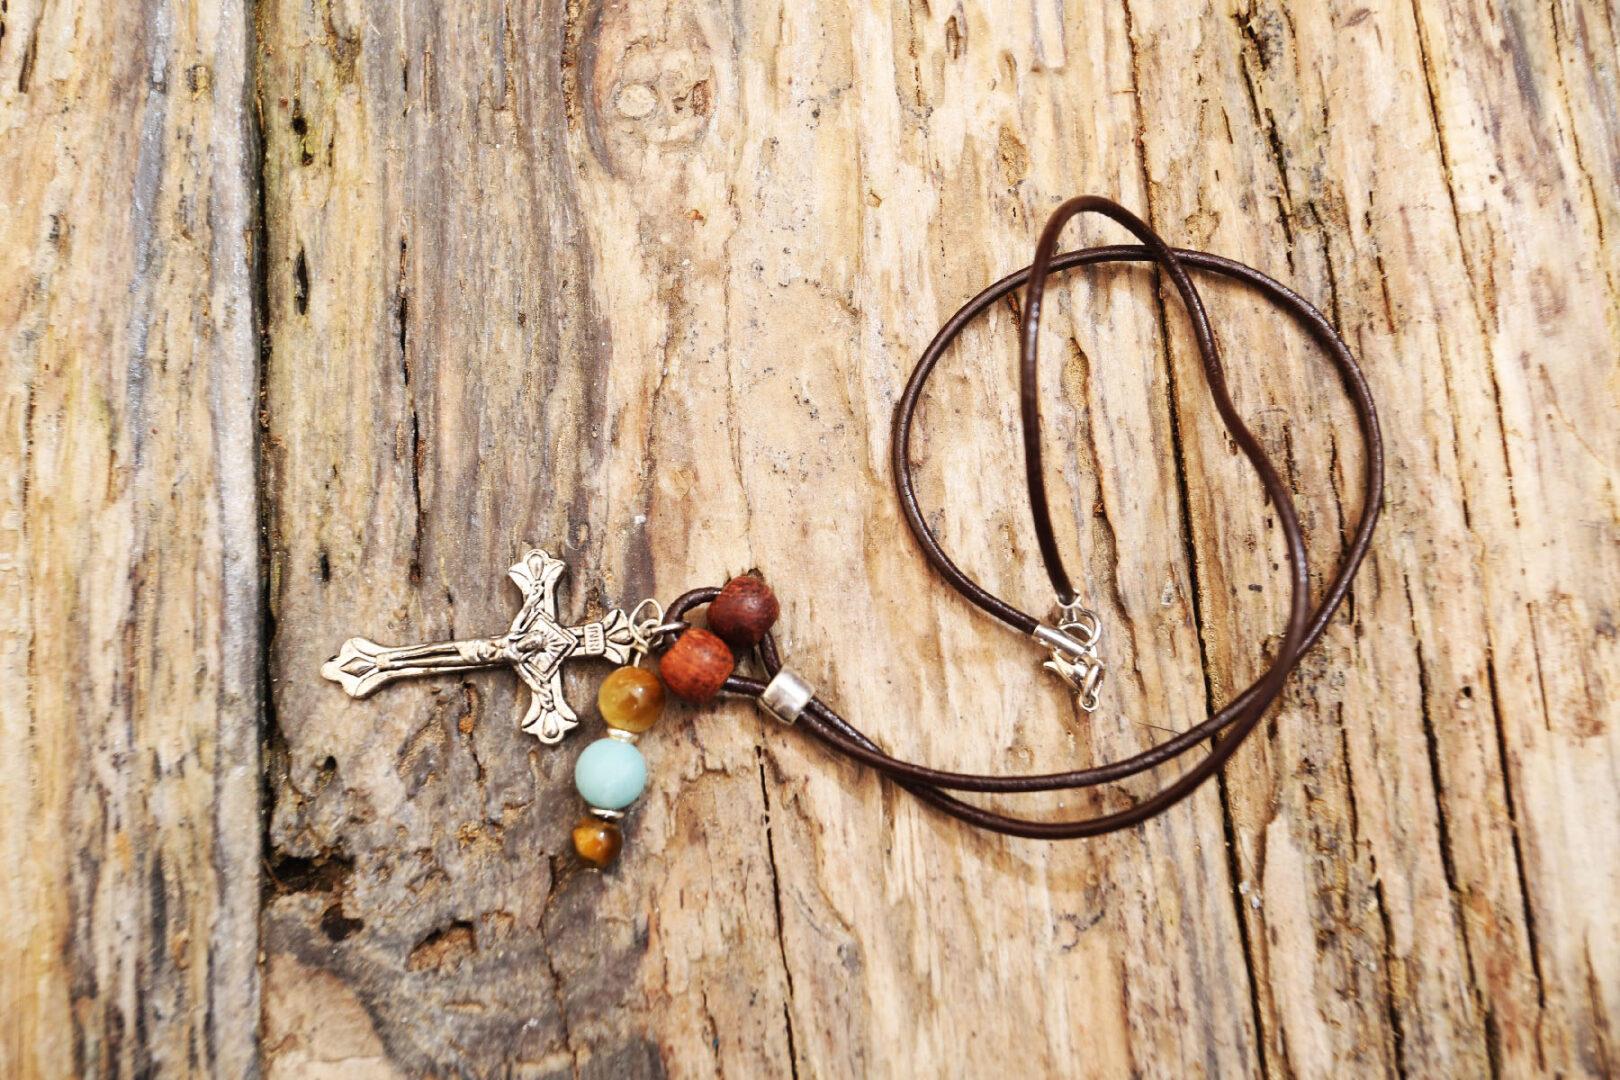 Holy Land jewelry